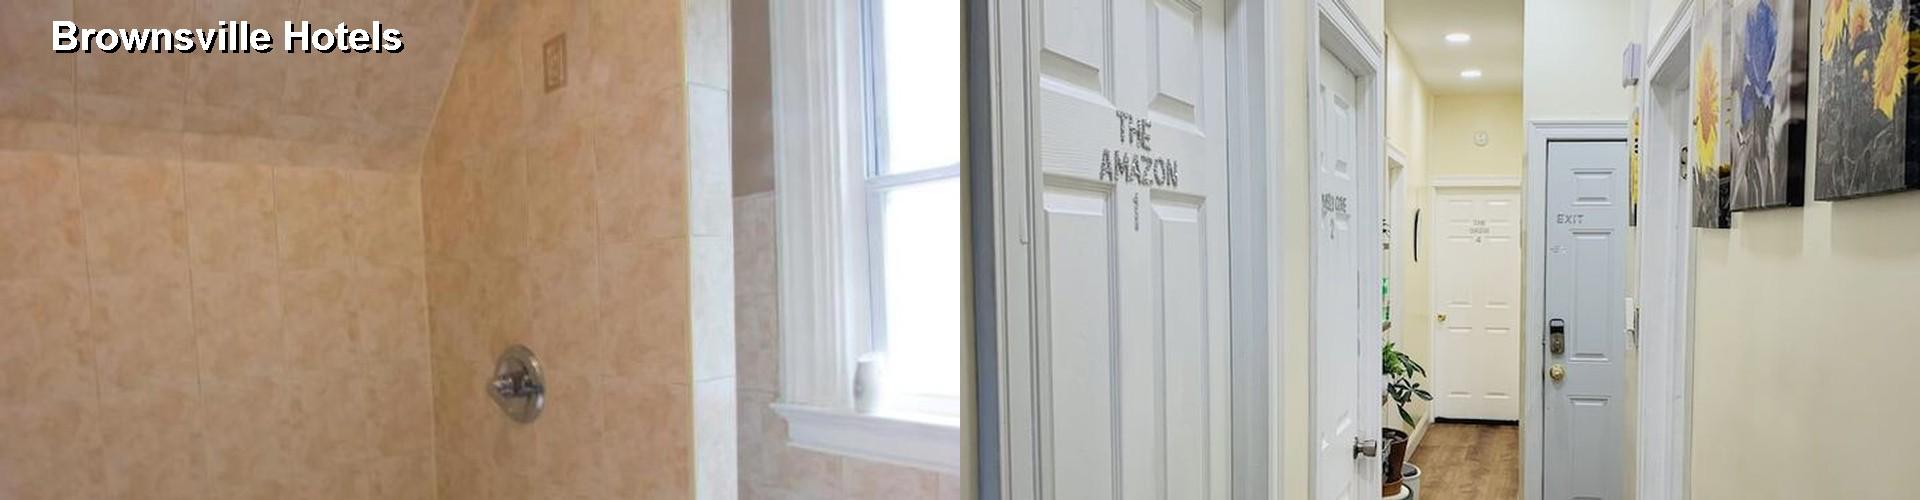 2 Best Hotels Near Brownsville